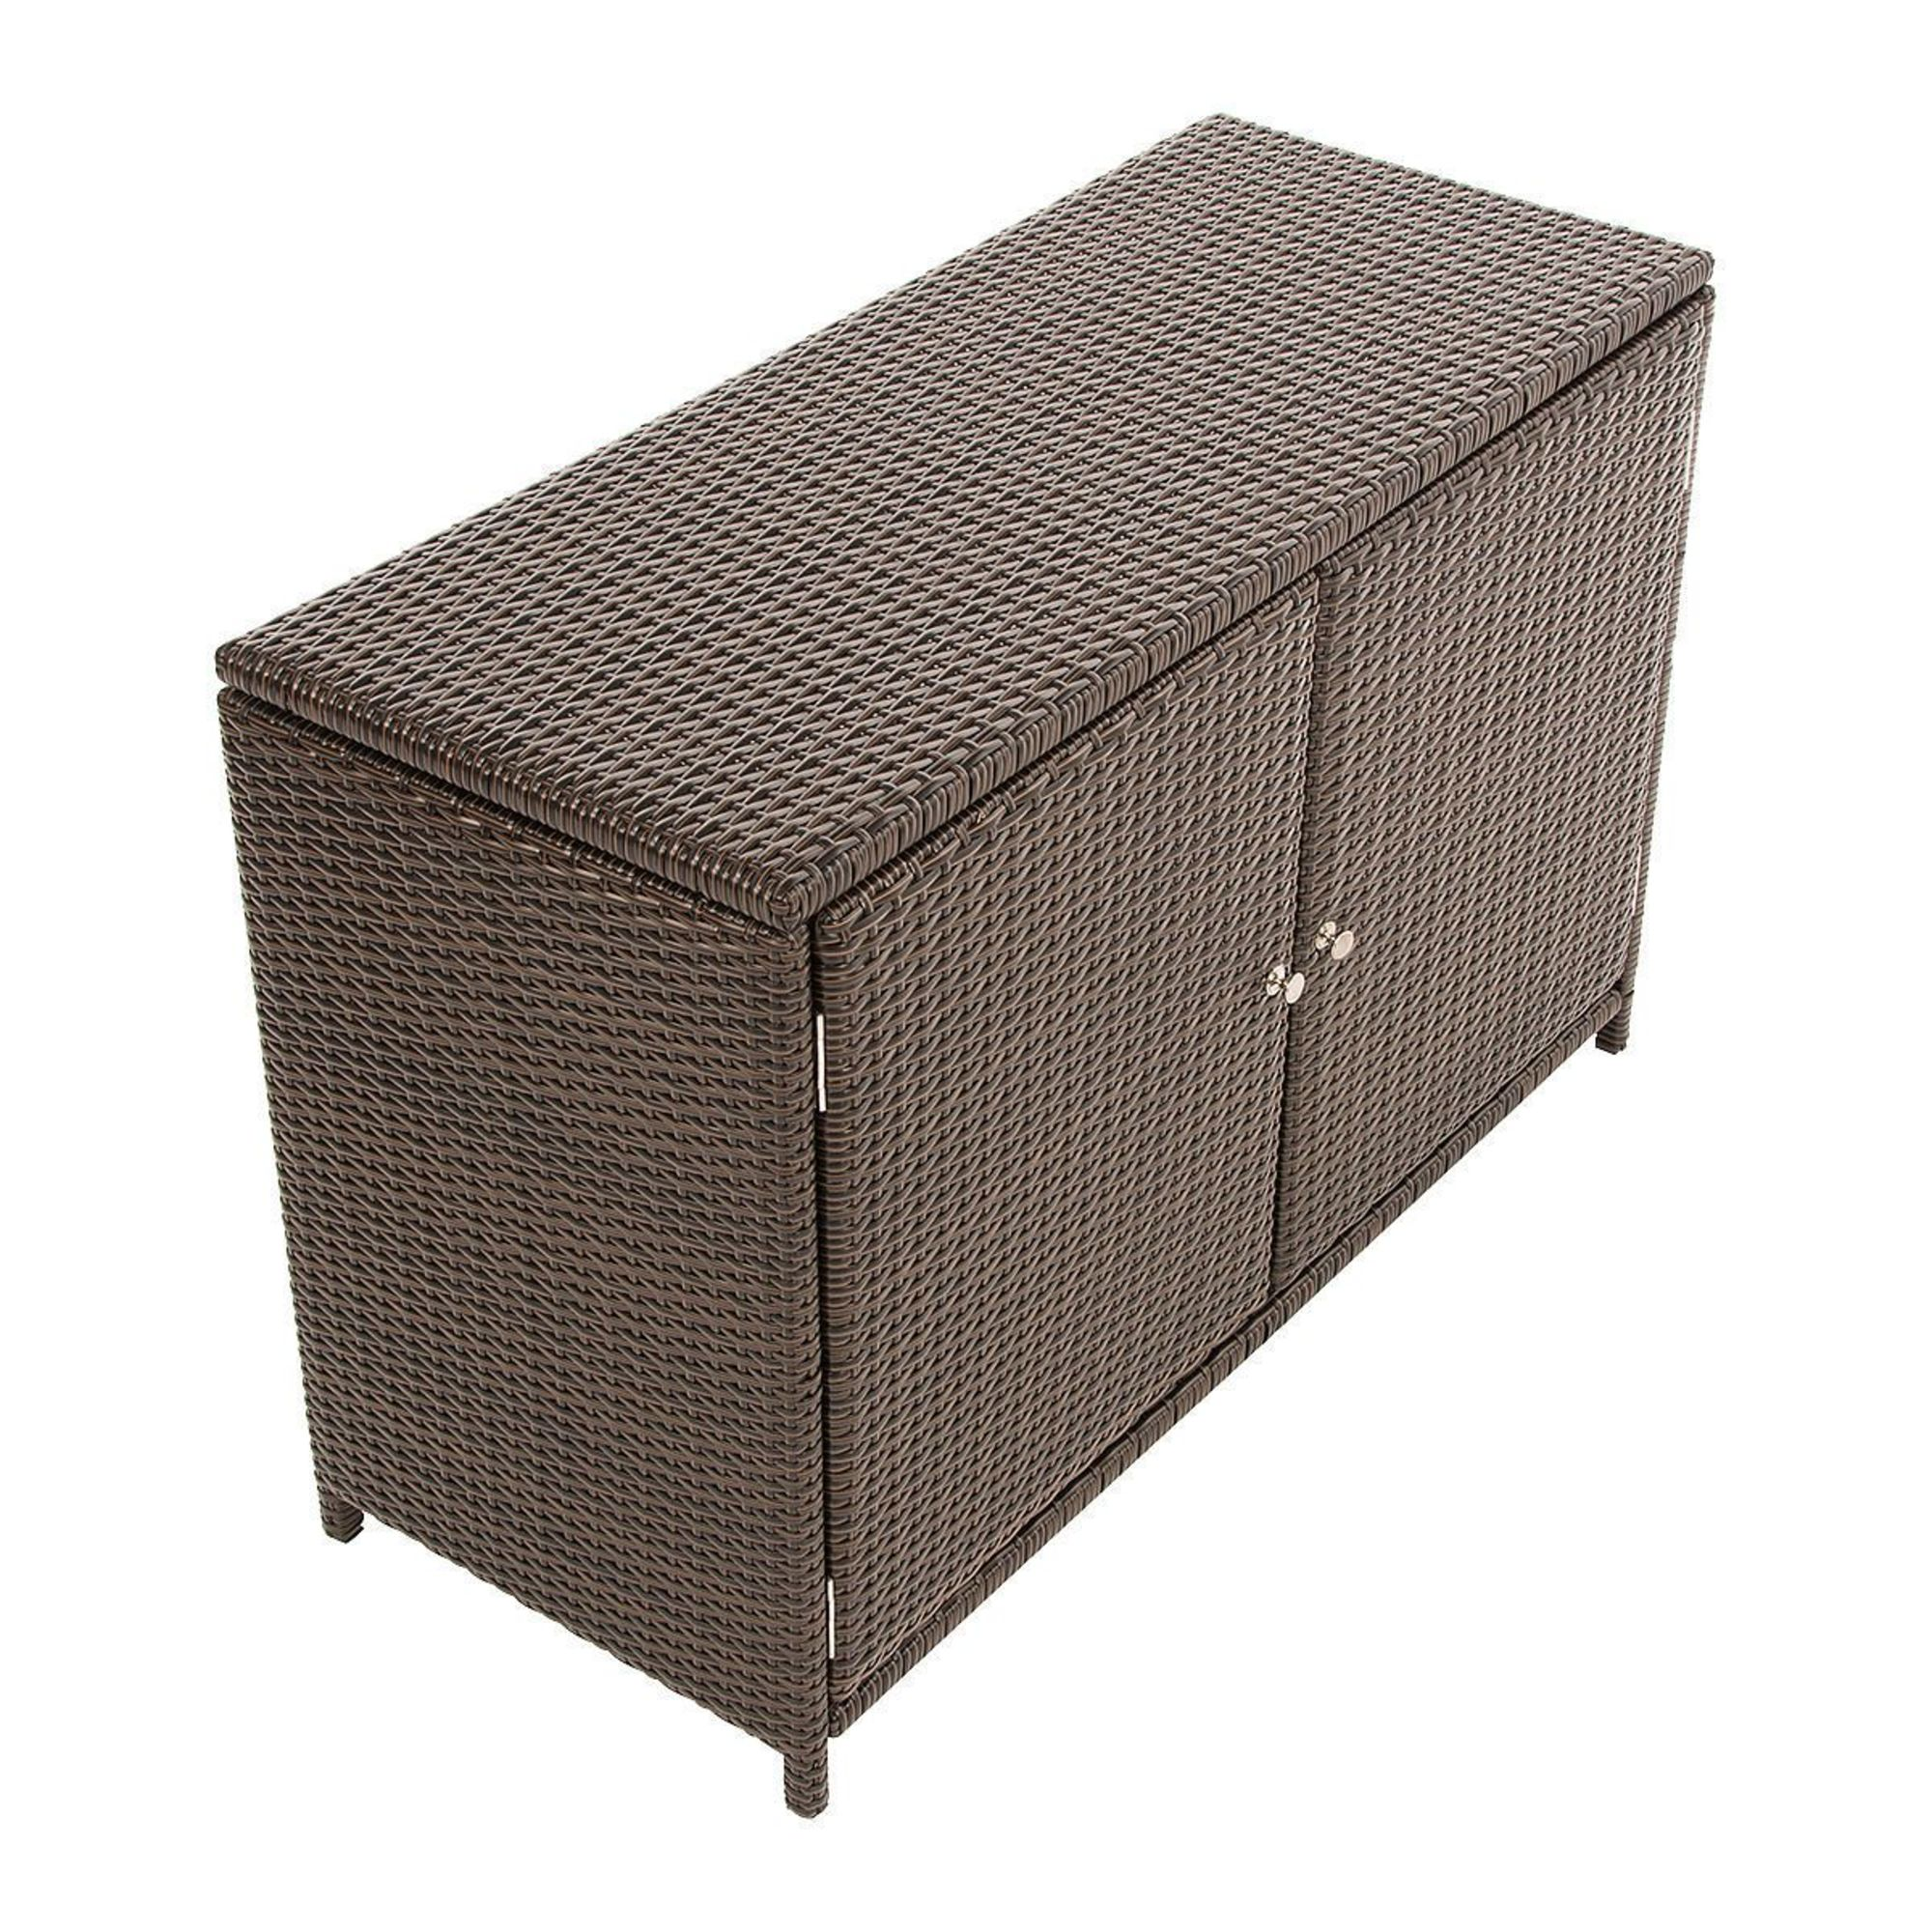 rattan schrank outdoor ag48 hitoiro. Black Bedroom Furniture Sets. Home Design Ideas